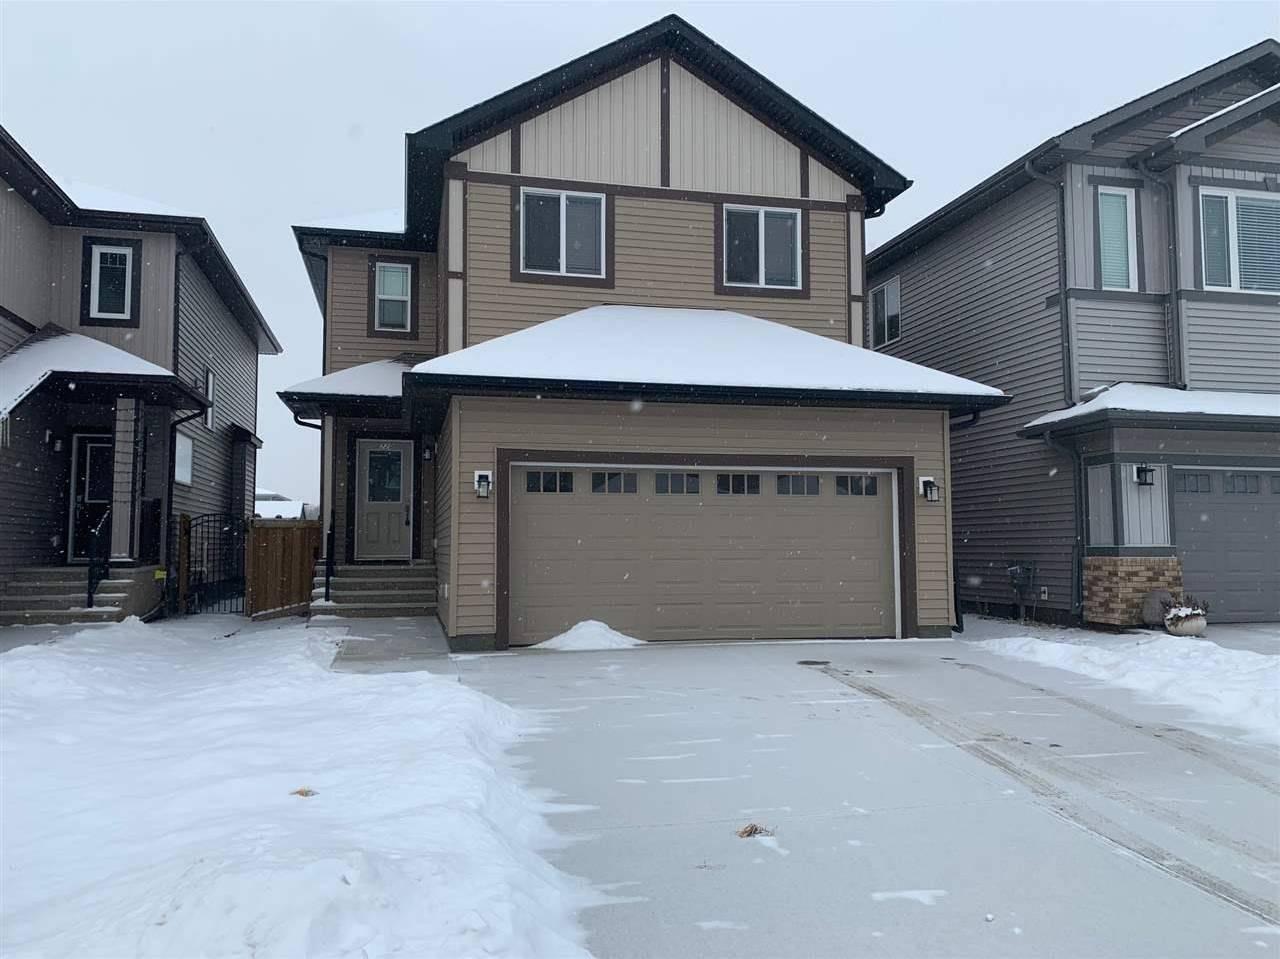 House for sale at 720 179 St Sw Edmonton Alberta - MLS: E4182119